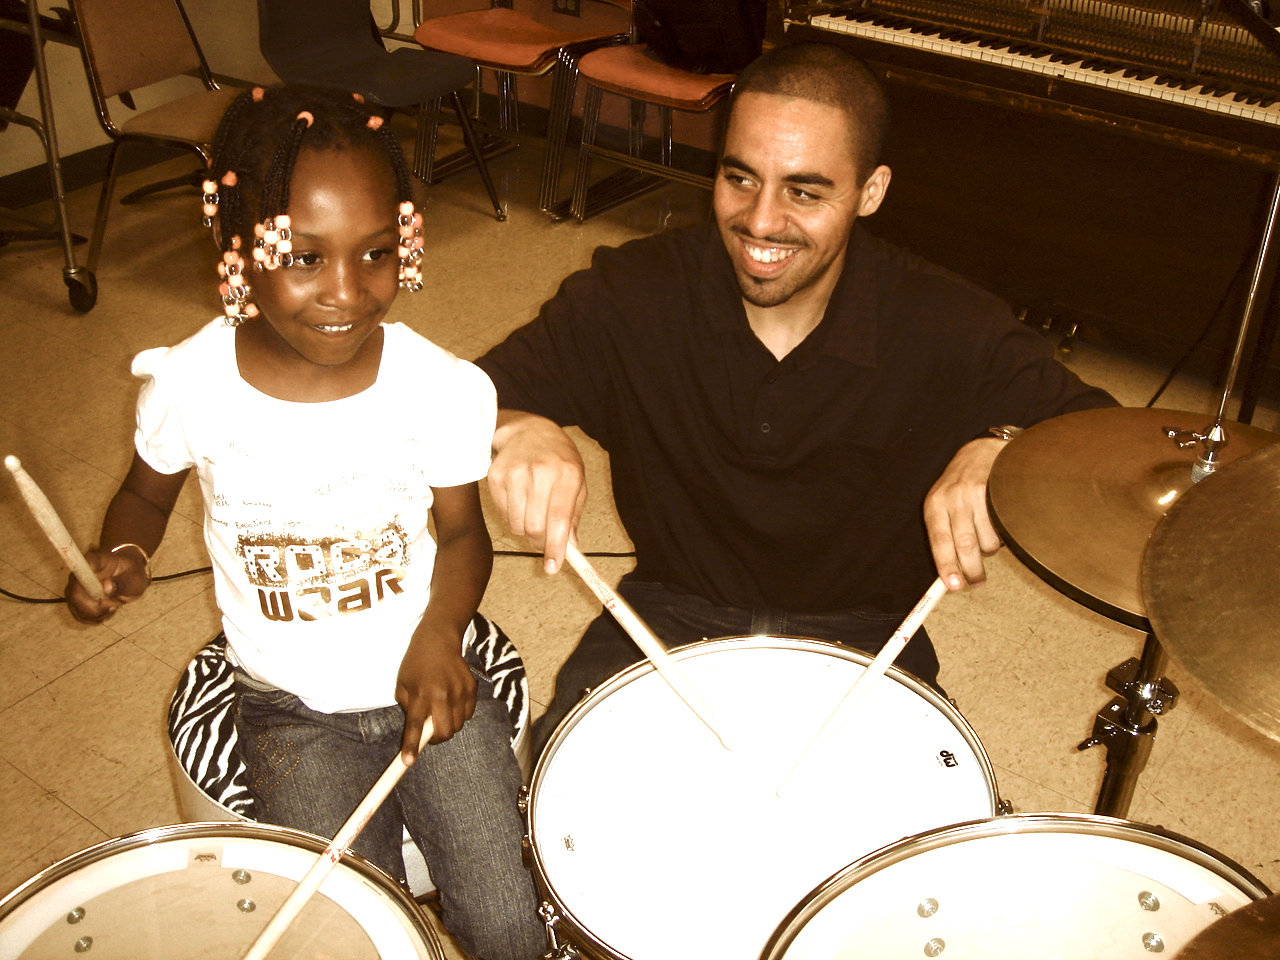 Begin/Intrm Drum set Lesson: 30 minutes